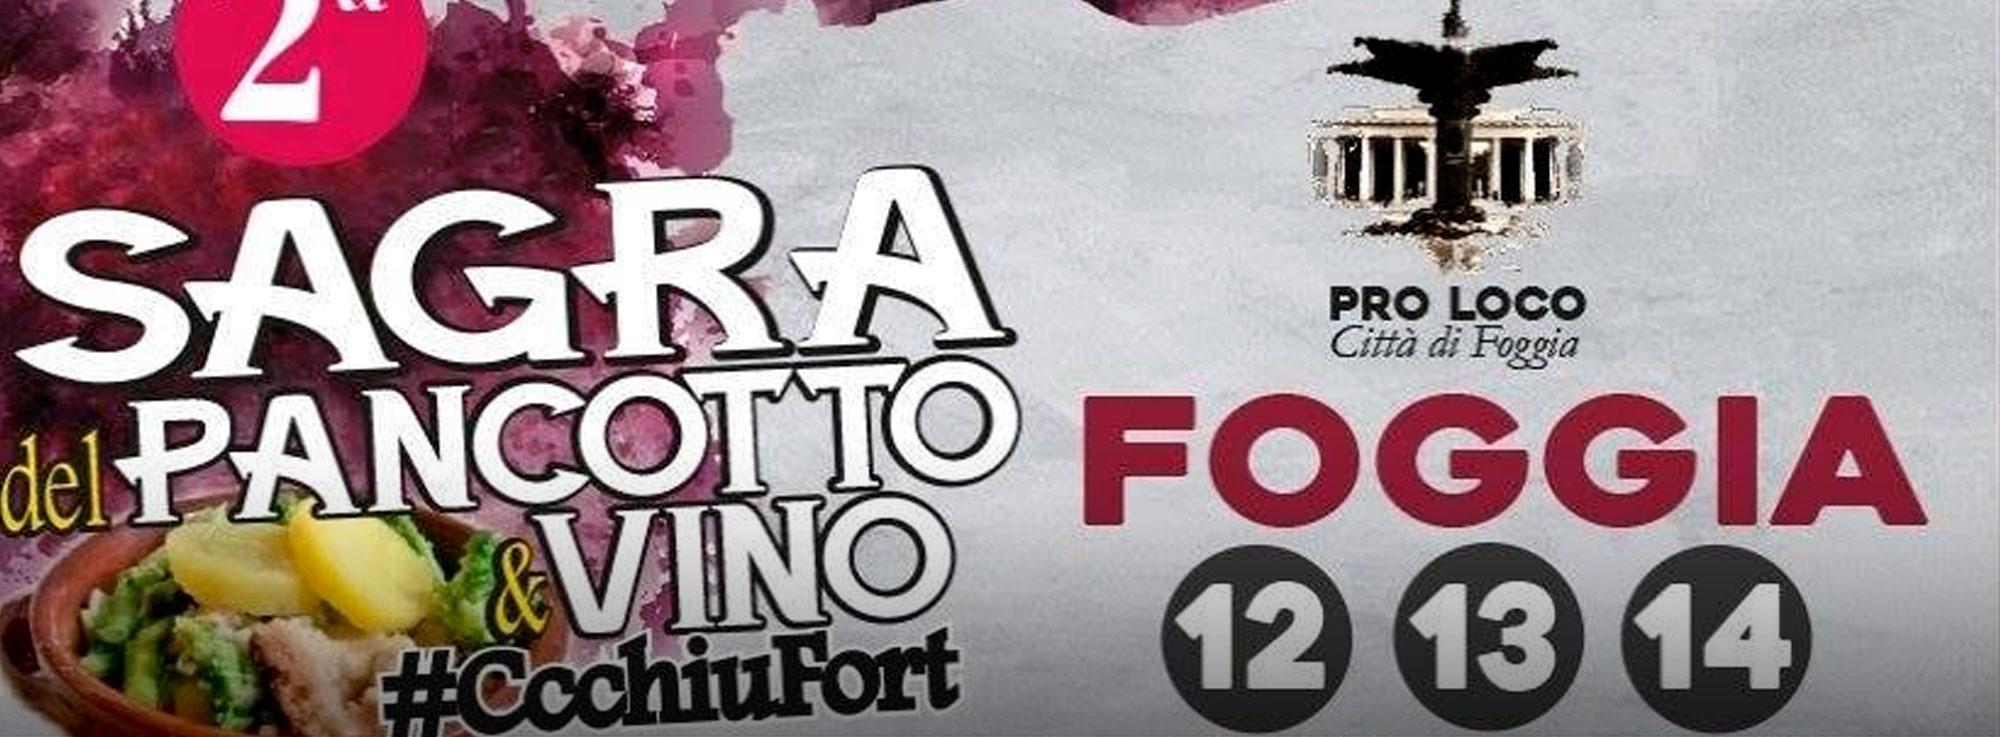 Foggia: Sagra del Pancotto & Vino #CcchiuFort.